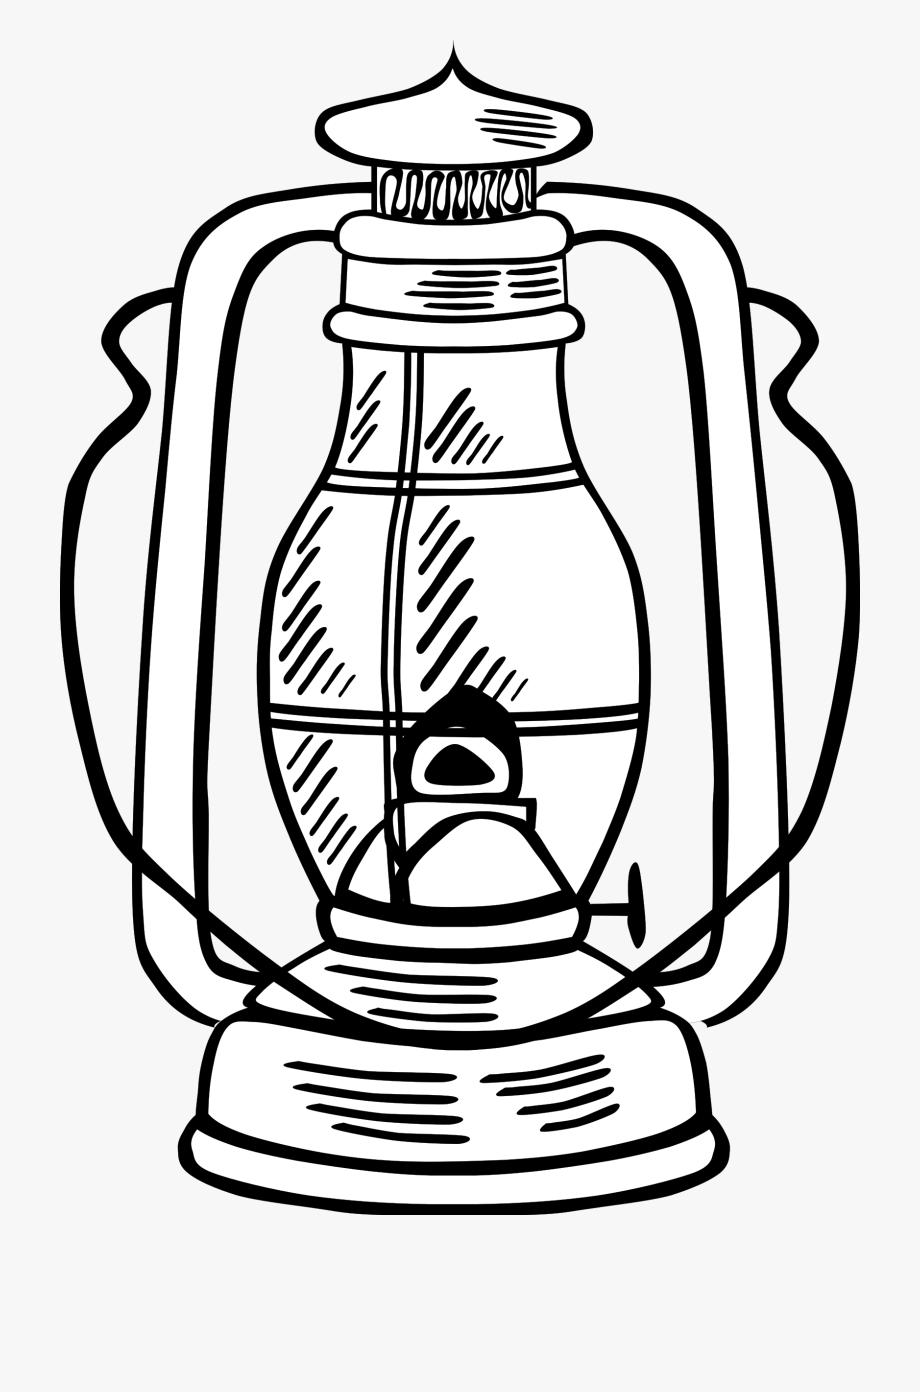 Graphic transparent download drawn. Hurricane clipart cute